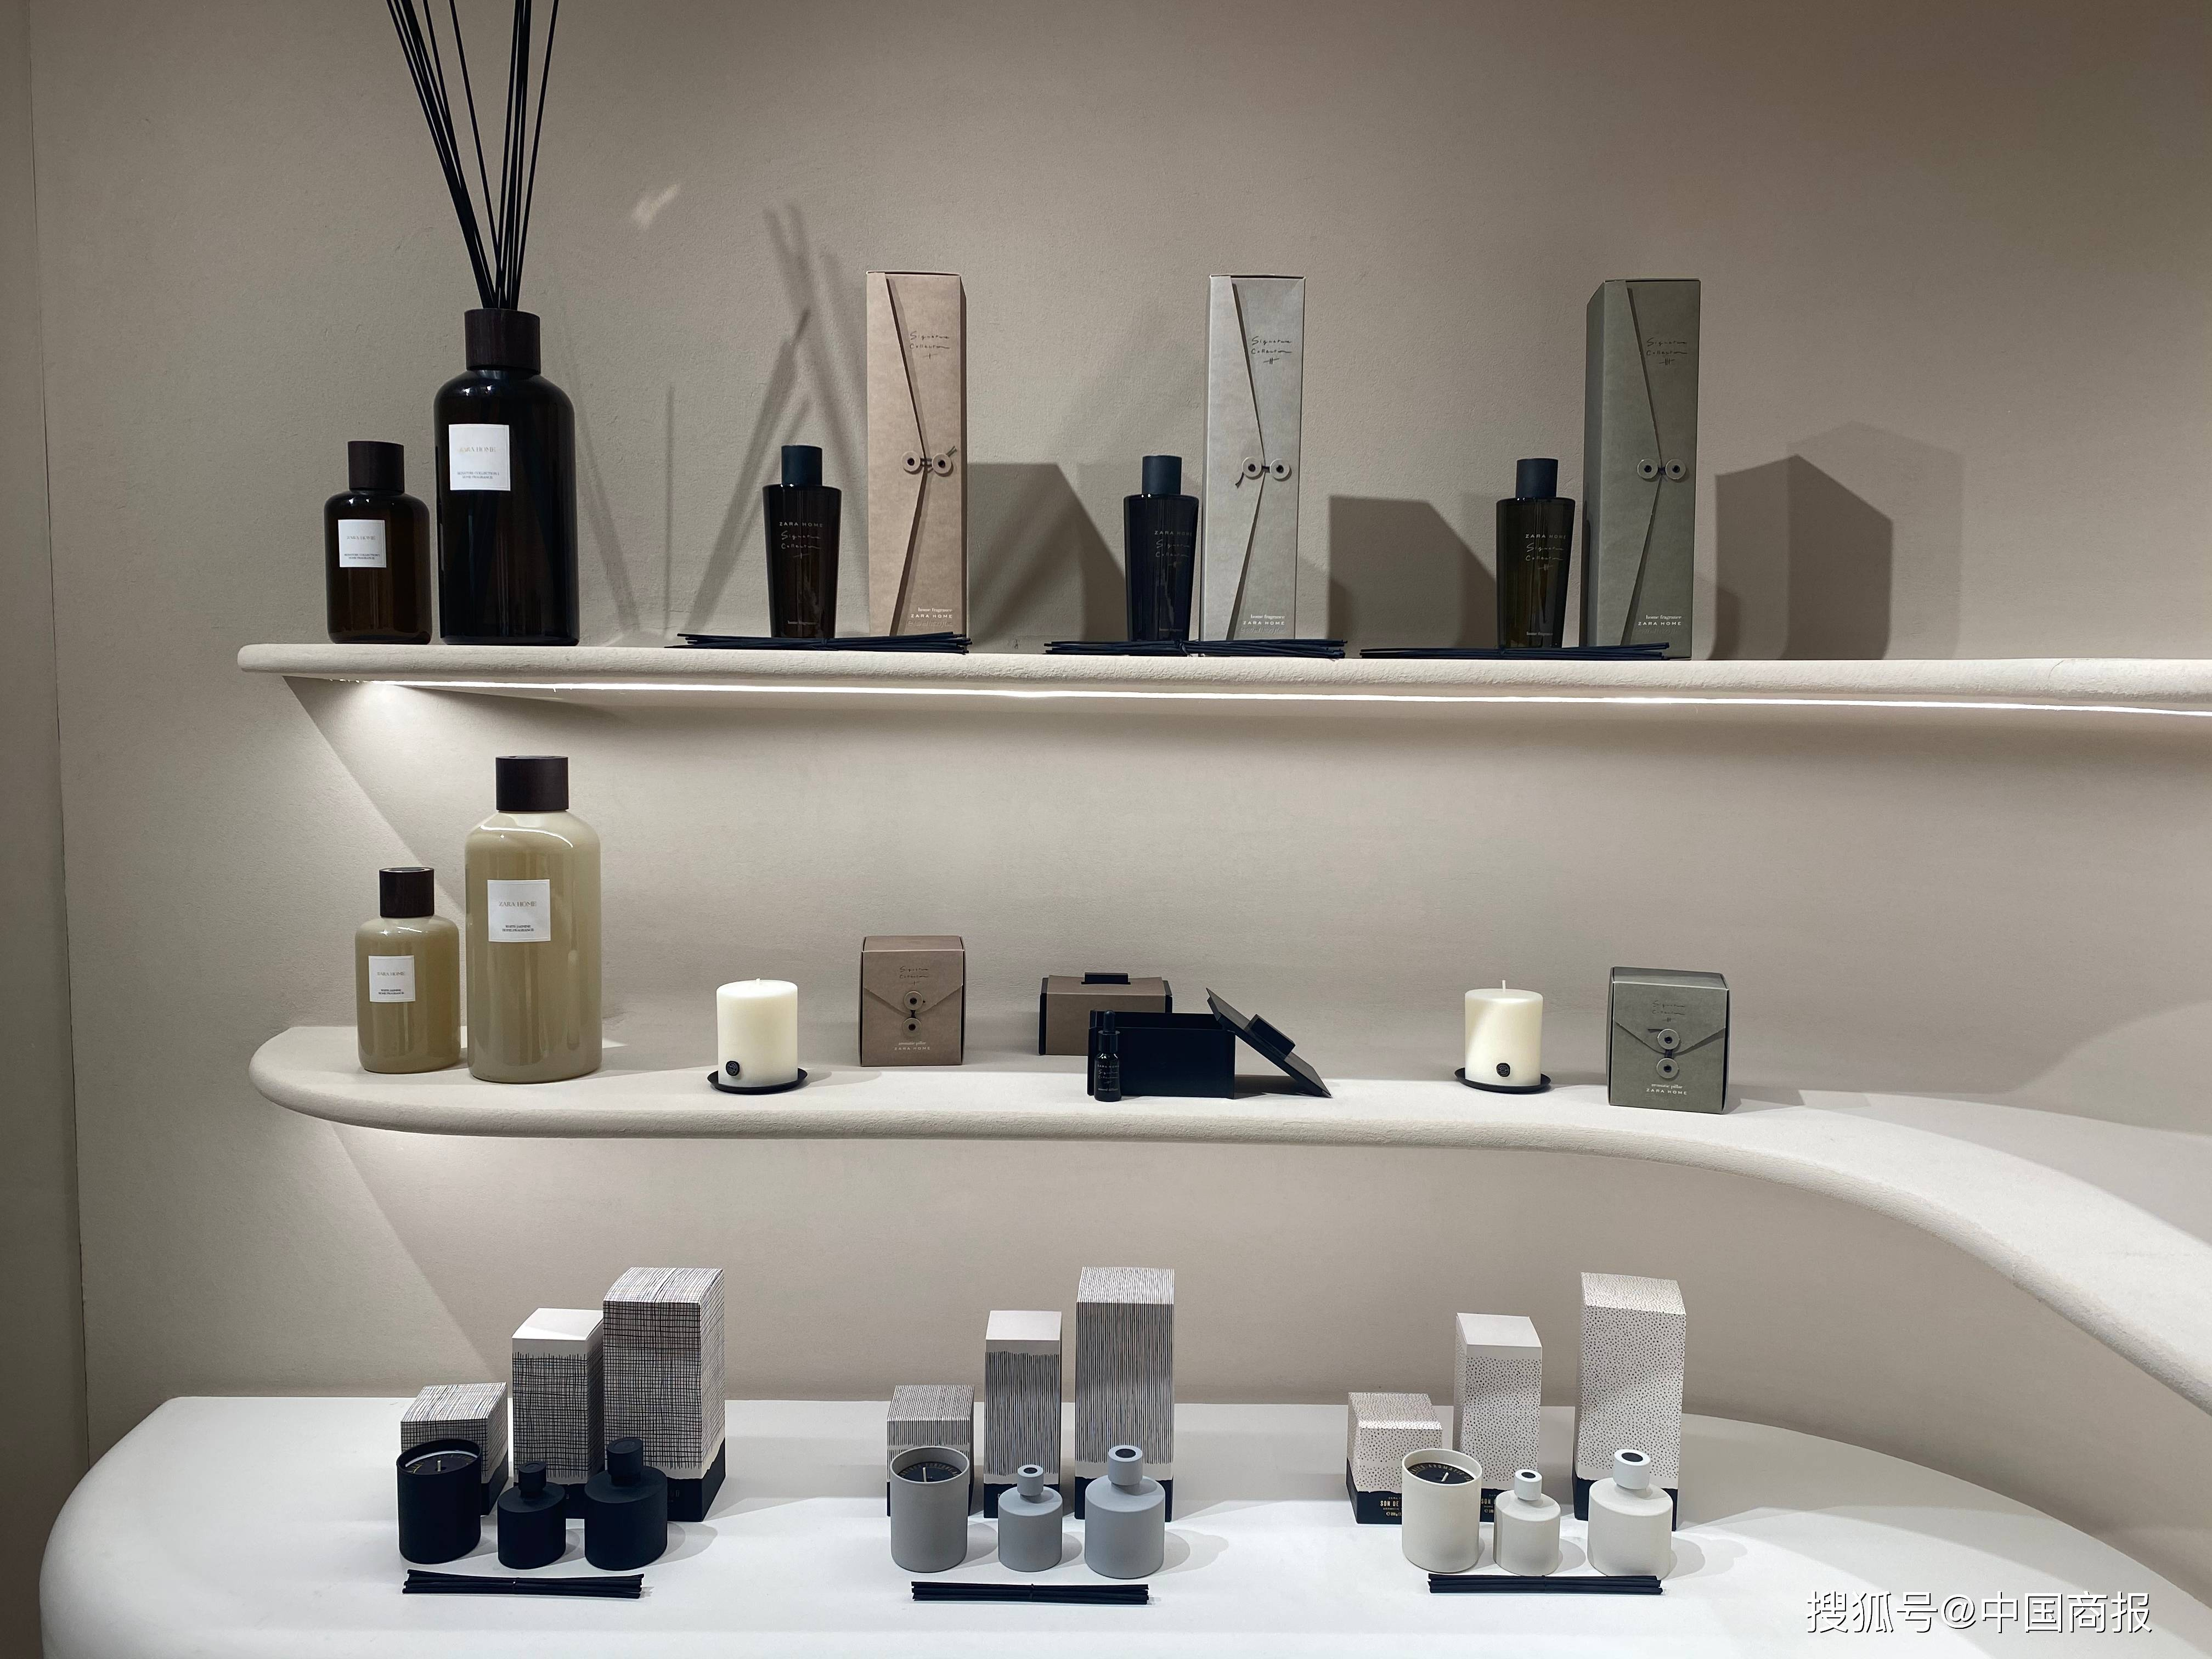 Zara亚洲最大门店落地北京 要在中国市场大展身手?